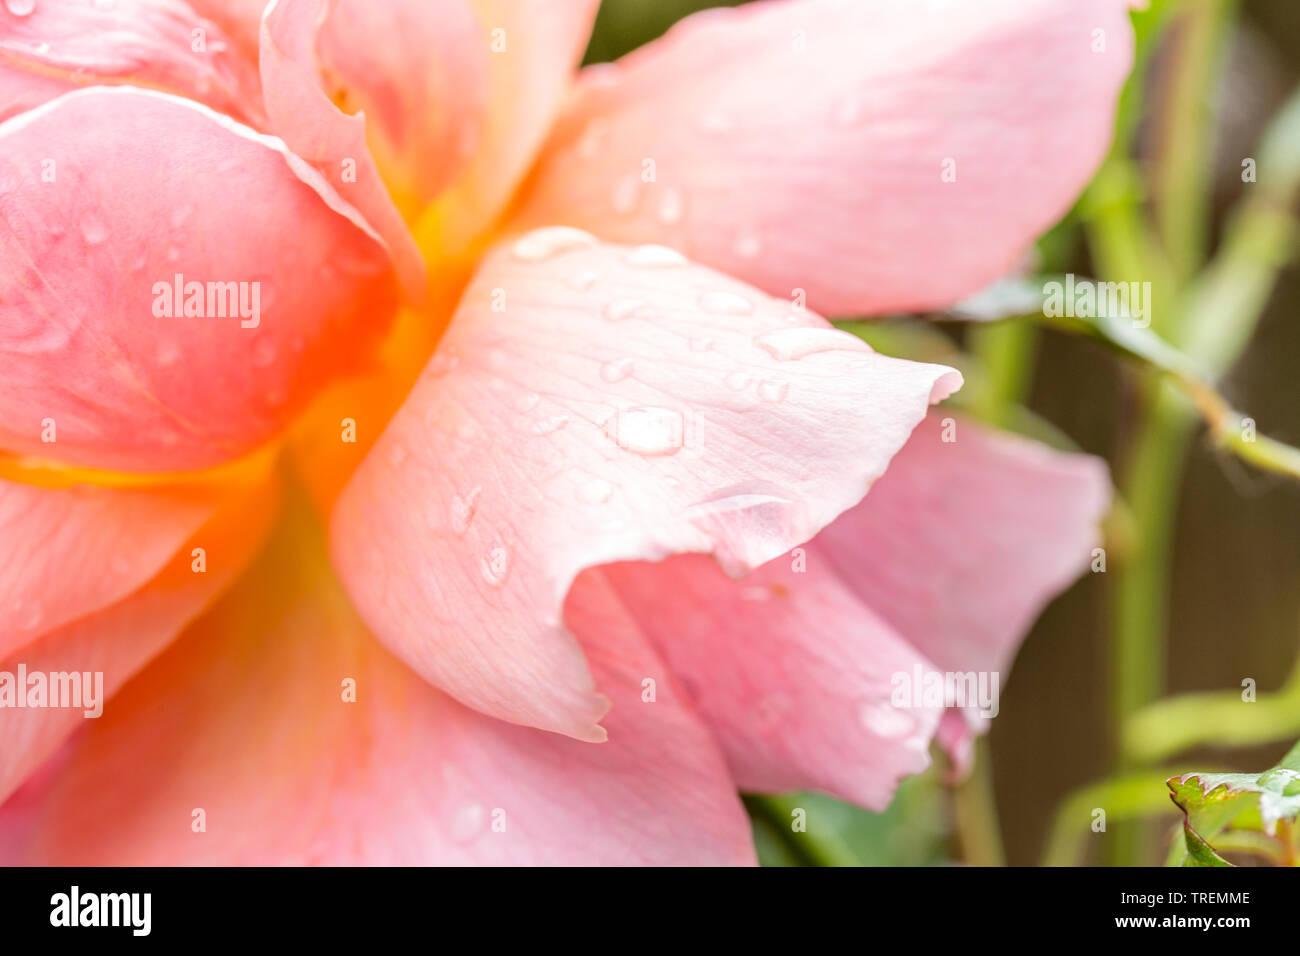 Close-up/macro of a peachy colored rose petal after rain. - Stock Image